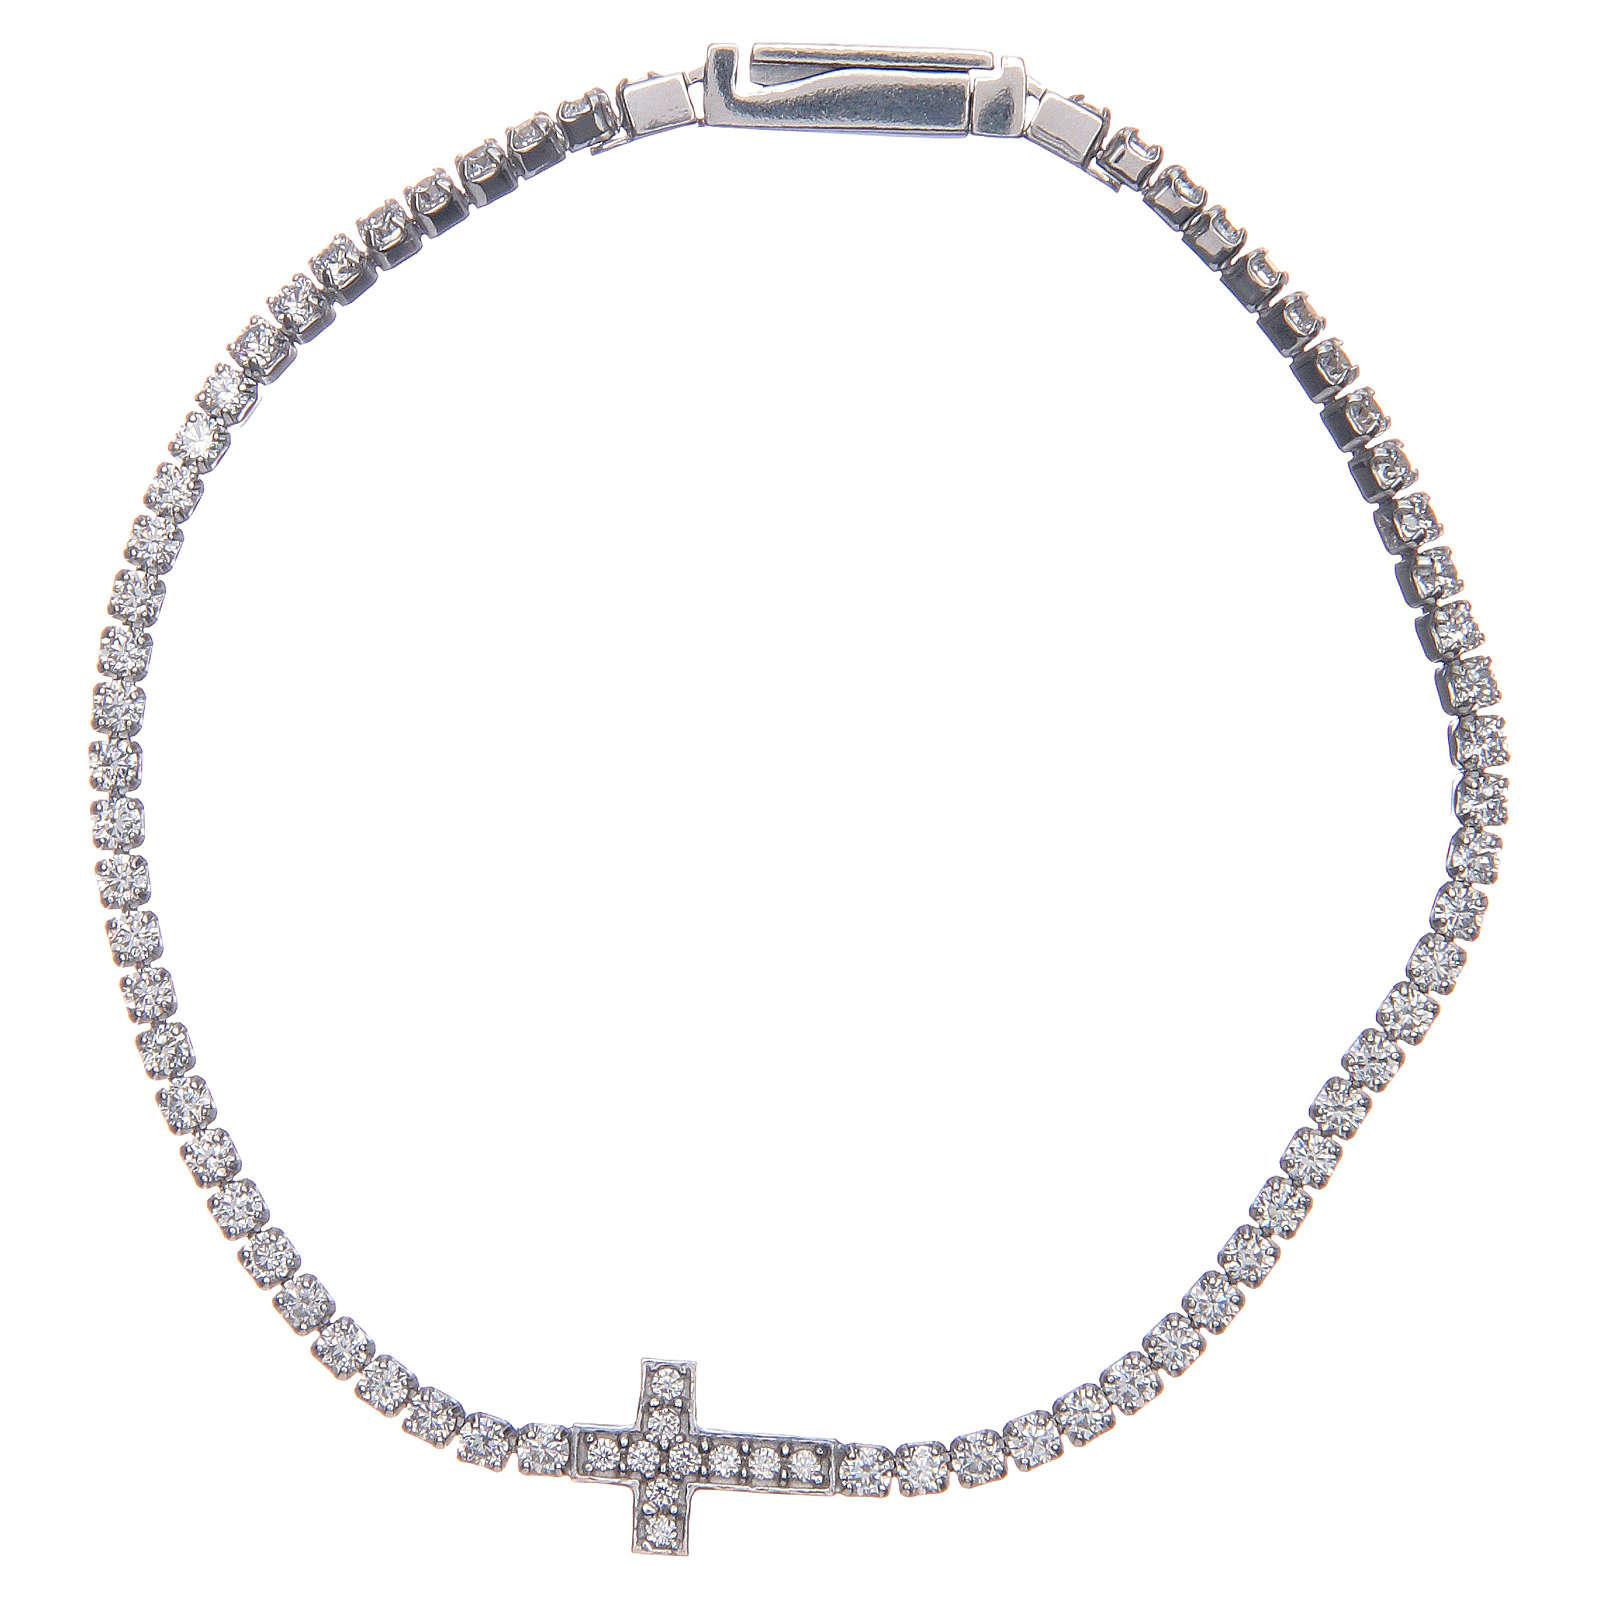 Bracciale Amen croce e zirconi bianchi argento 4